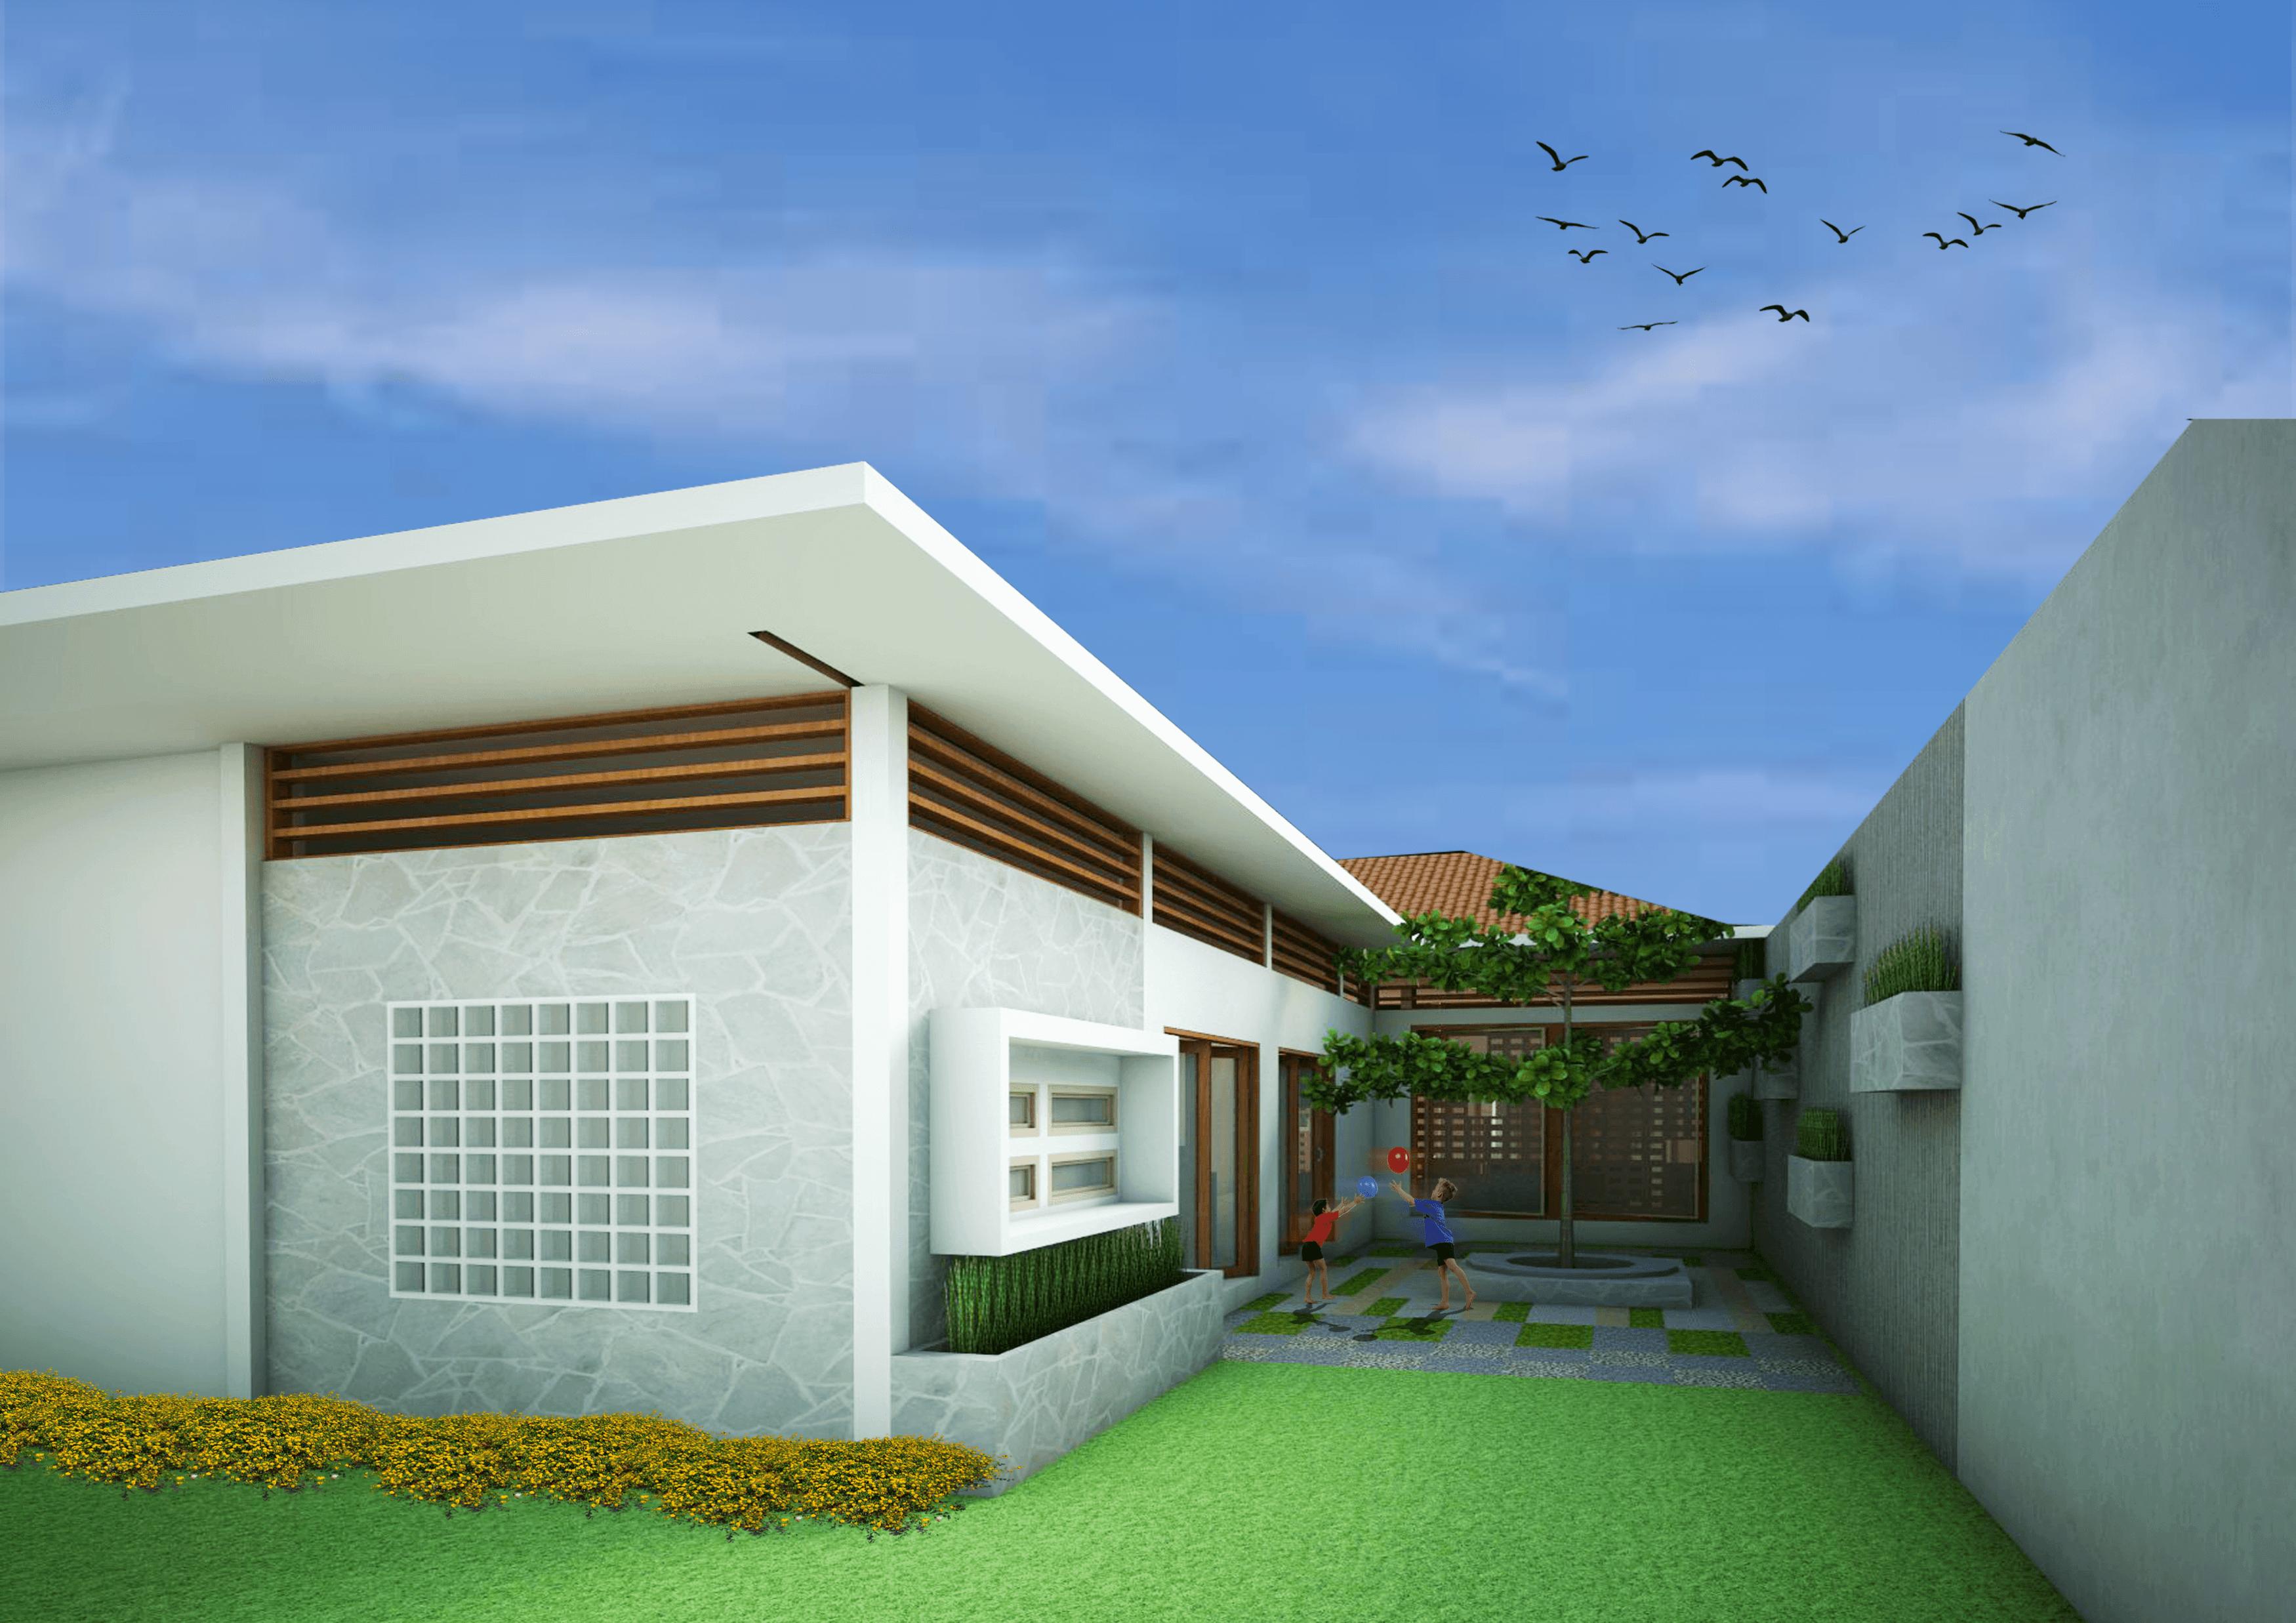 Vishaka Architect Studio Rumah A5 Sleman Regency, Special Region Of Yogyakarta, Indonesia Sleman Regency, Special Region Of Yogyakarta, Indonesia Eksterior-2   32488